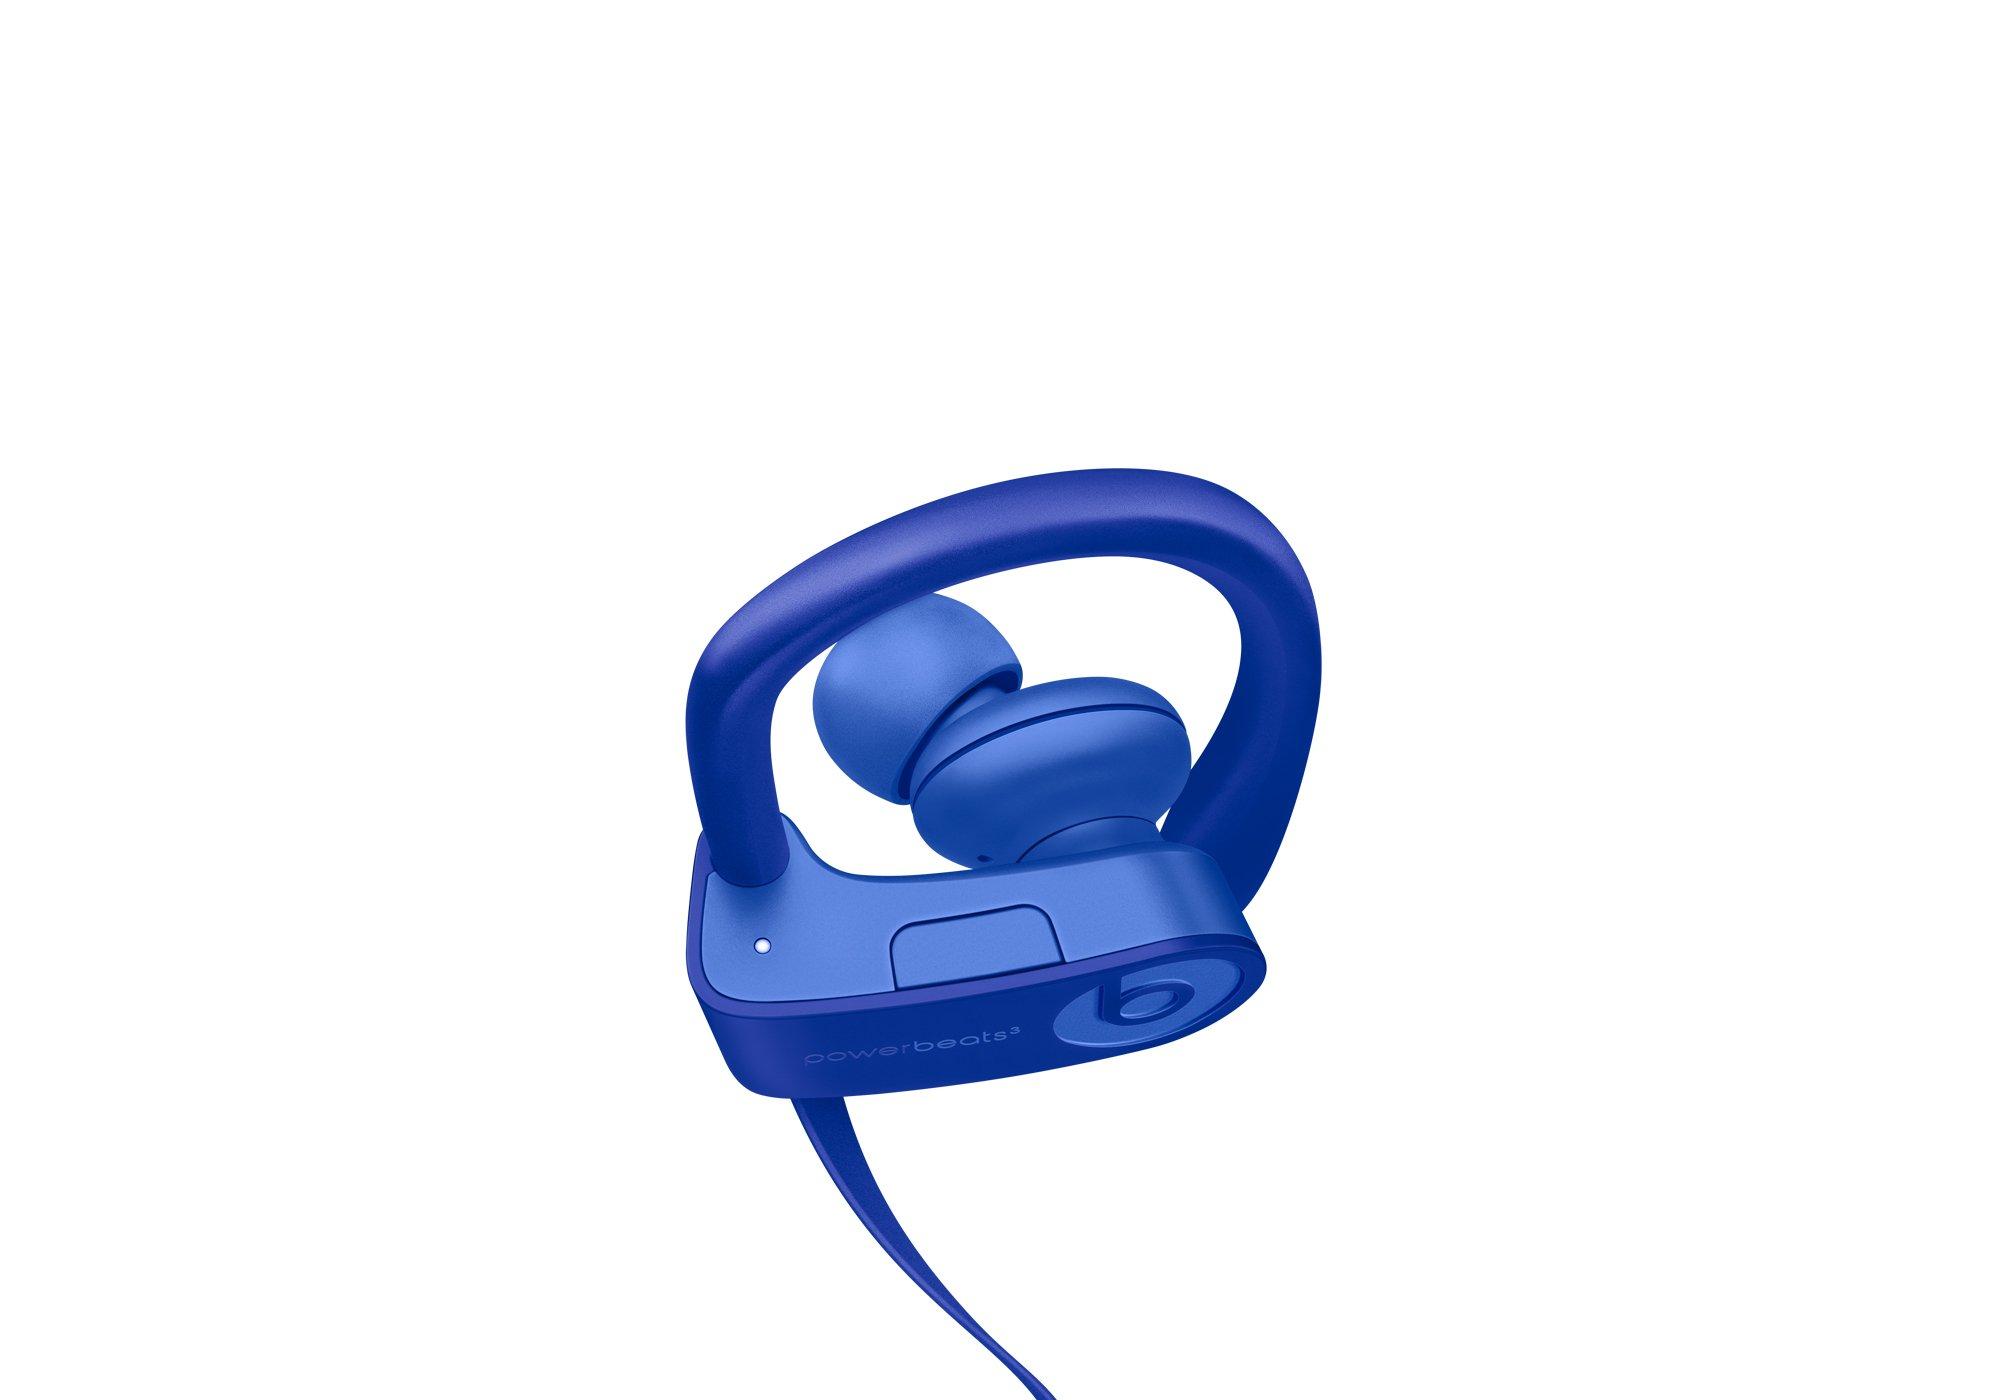 Powerbeats3 Wireless Earphones - Neighborhood Collection - Break Blue by Beats (Image #5)